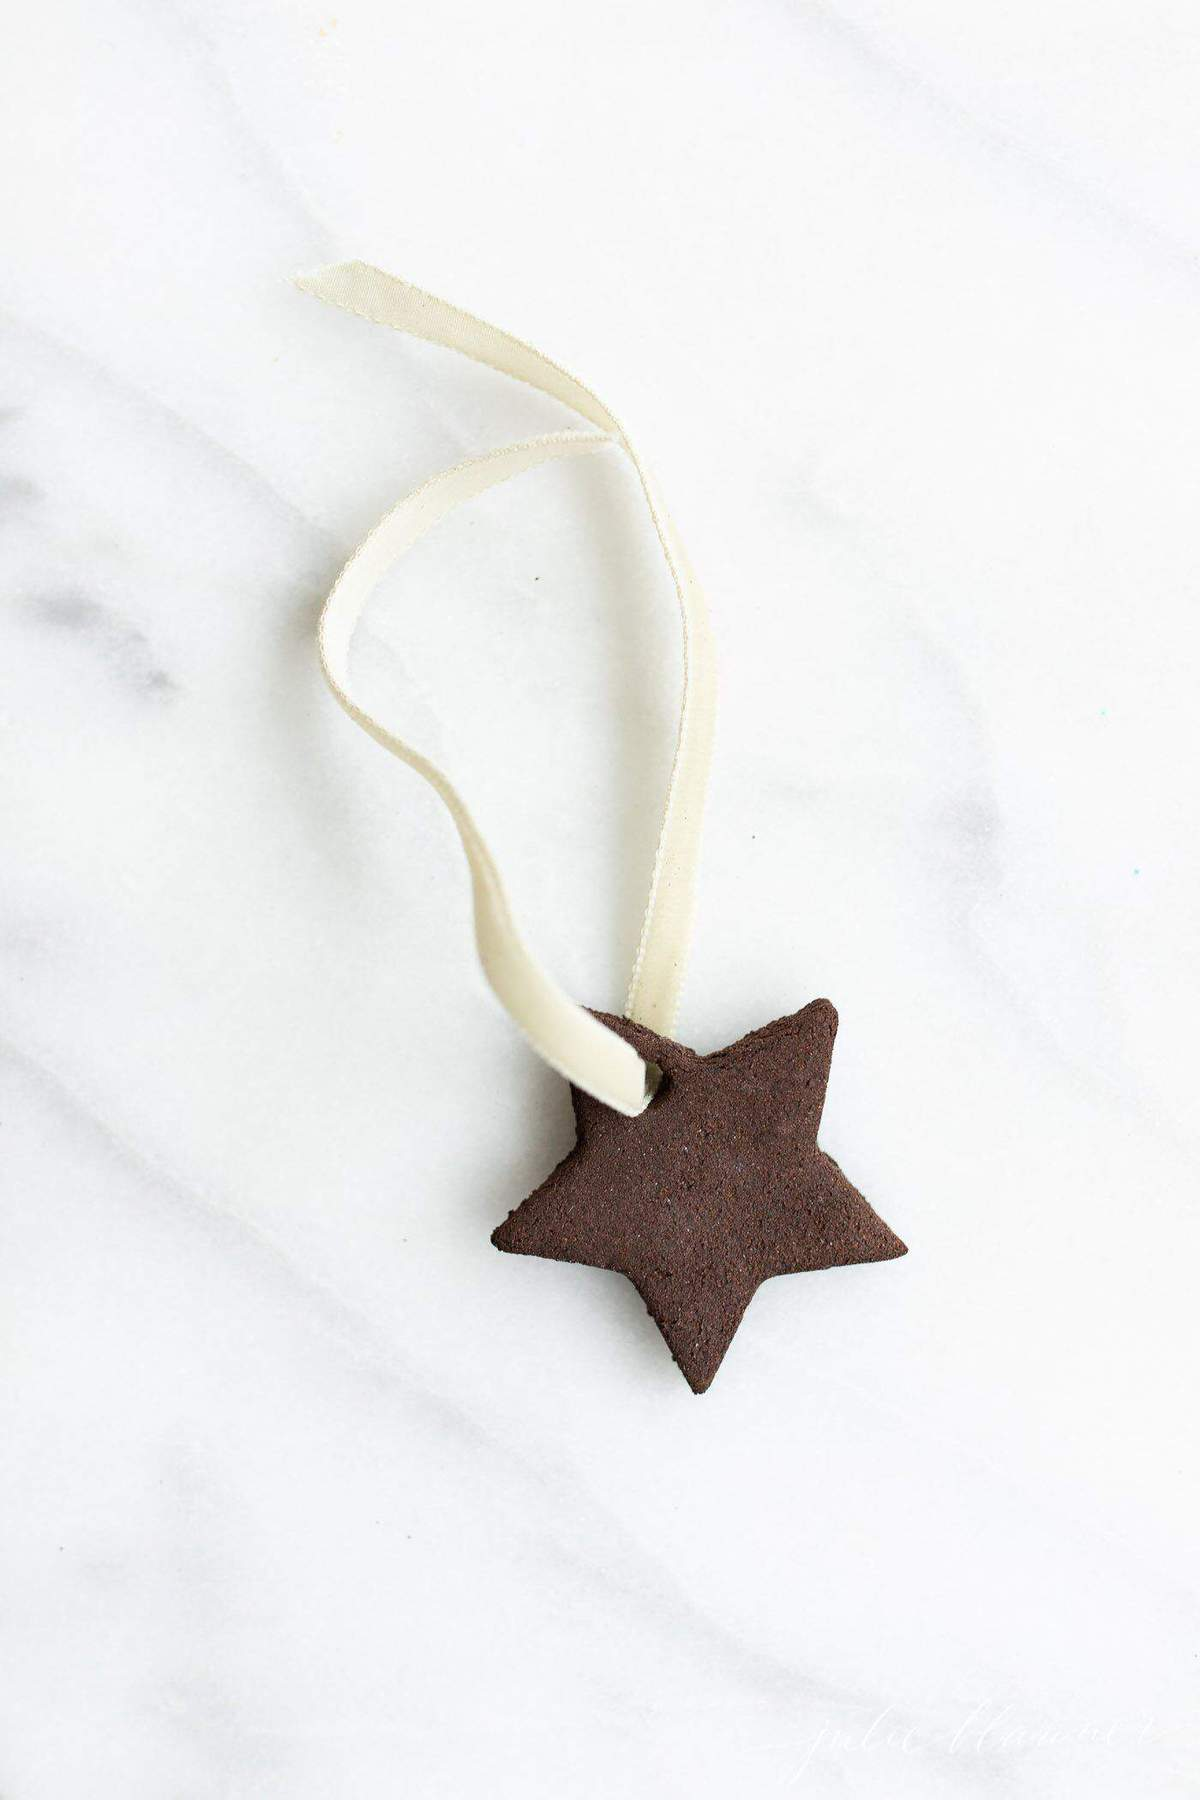 A single star handmade ornament on a marble surface.